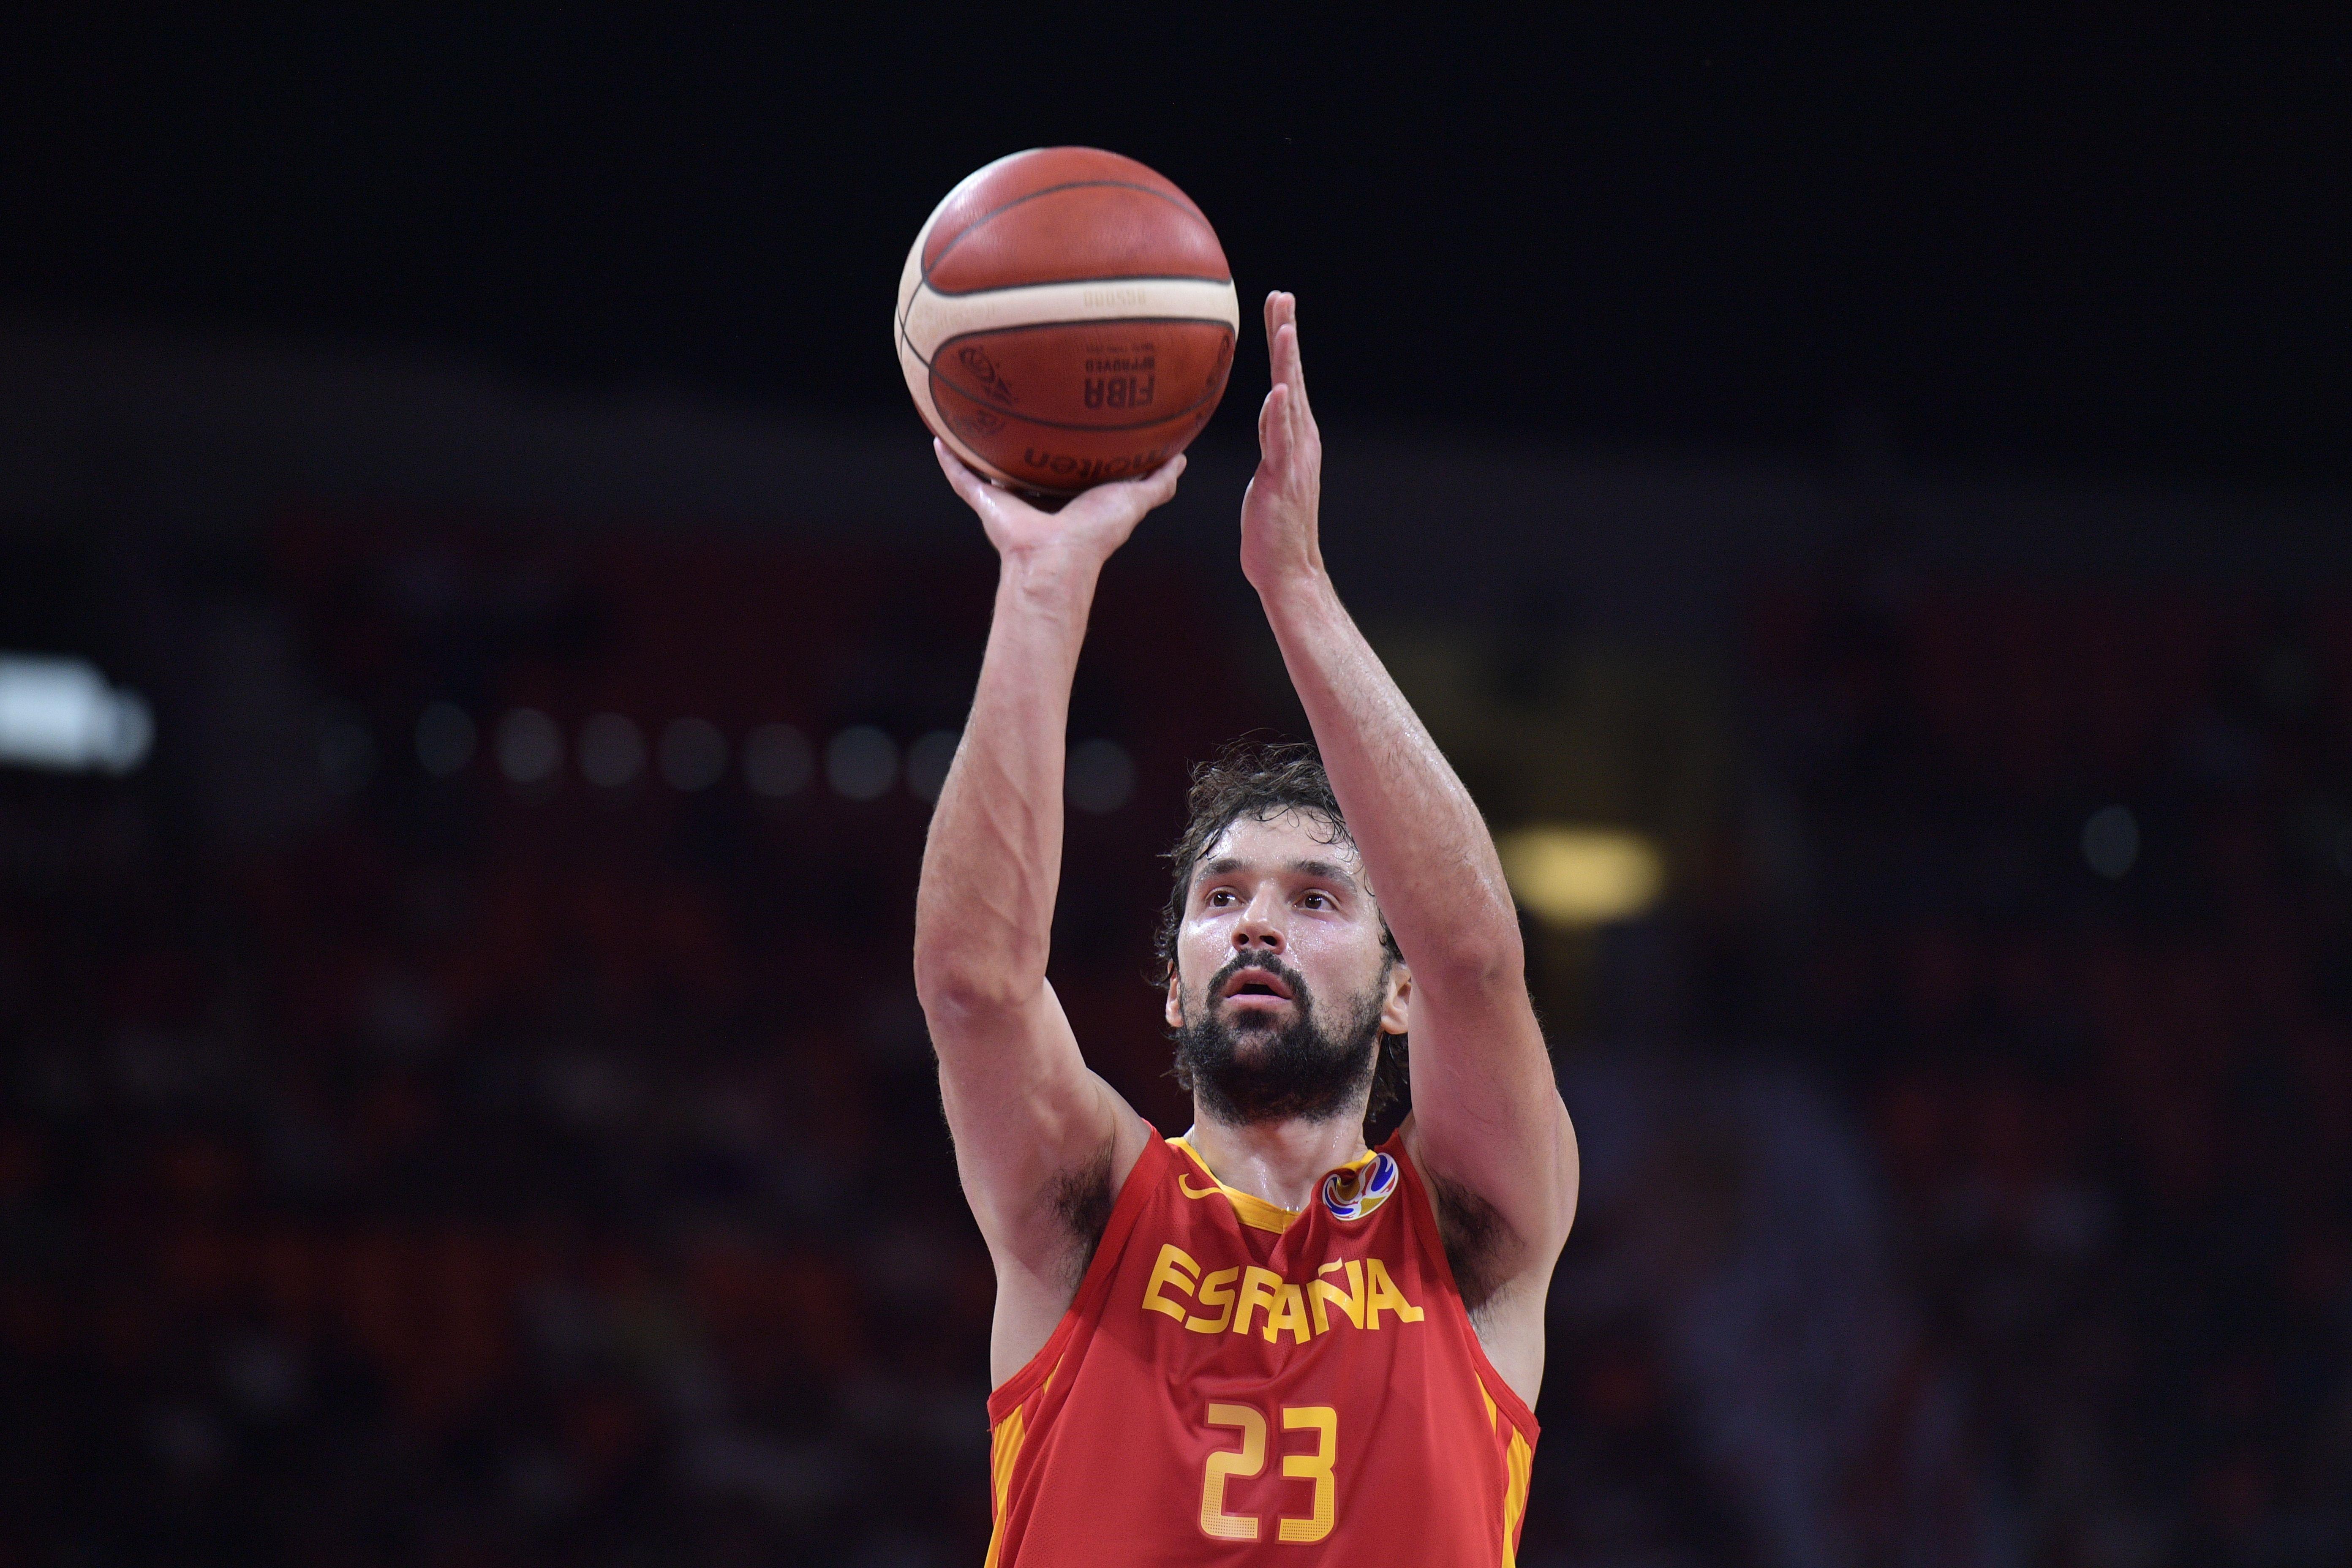 FIBA Basketball World Cup : Top 5 Day 3